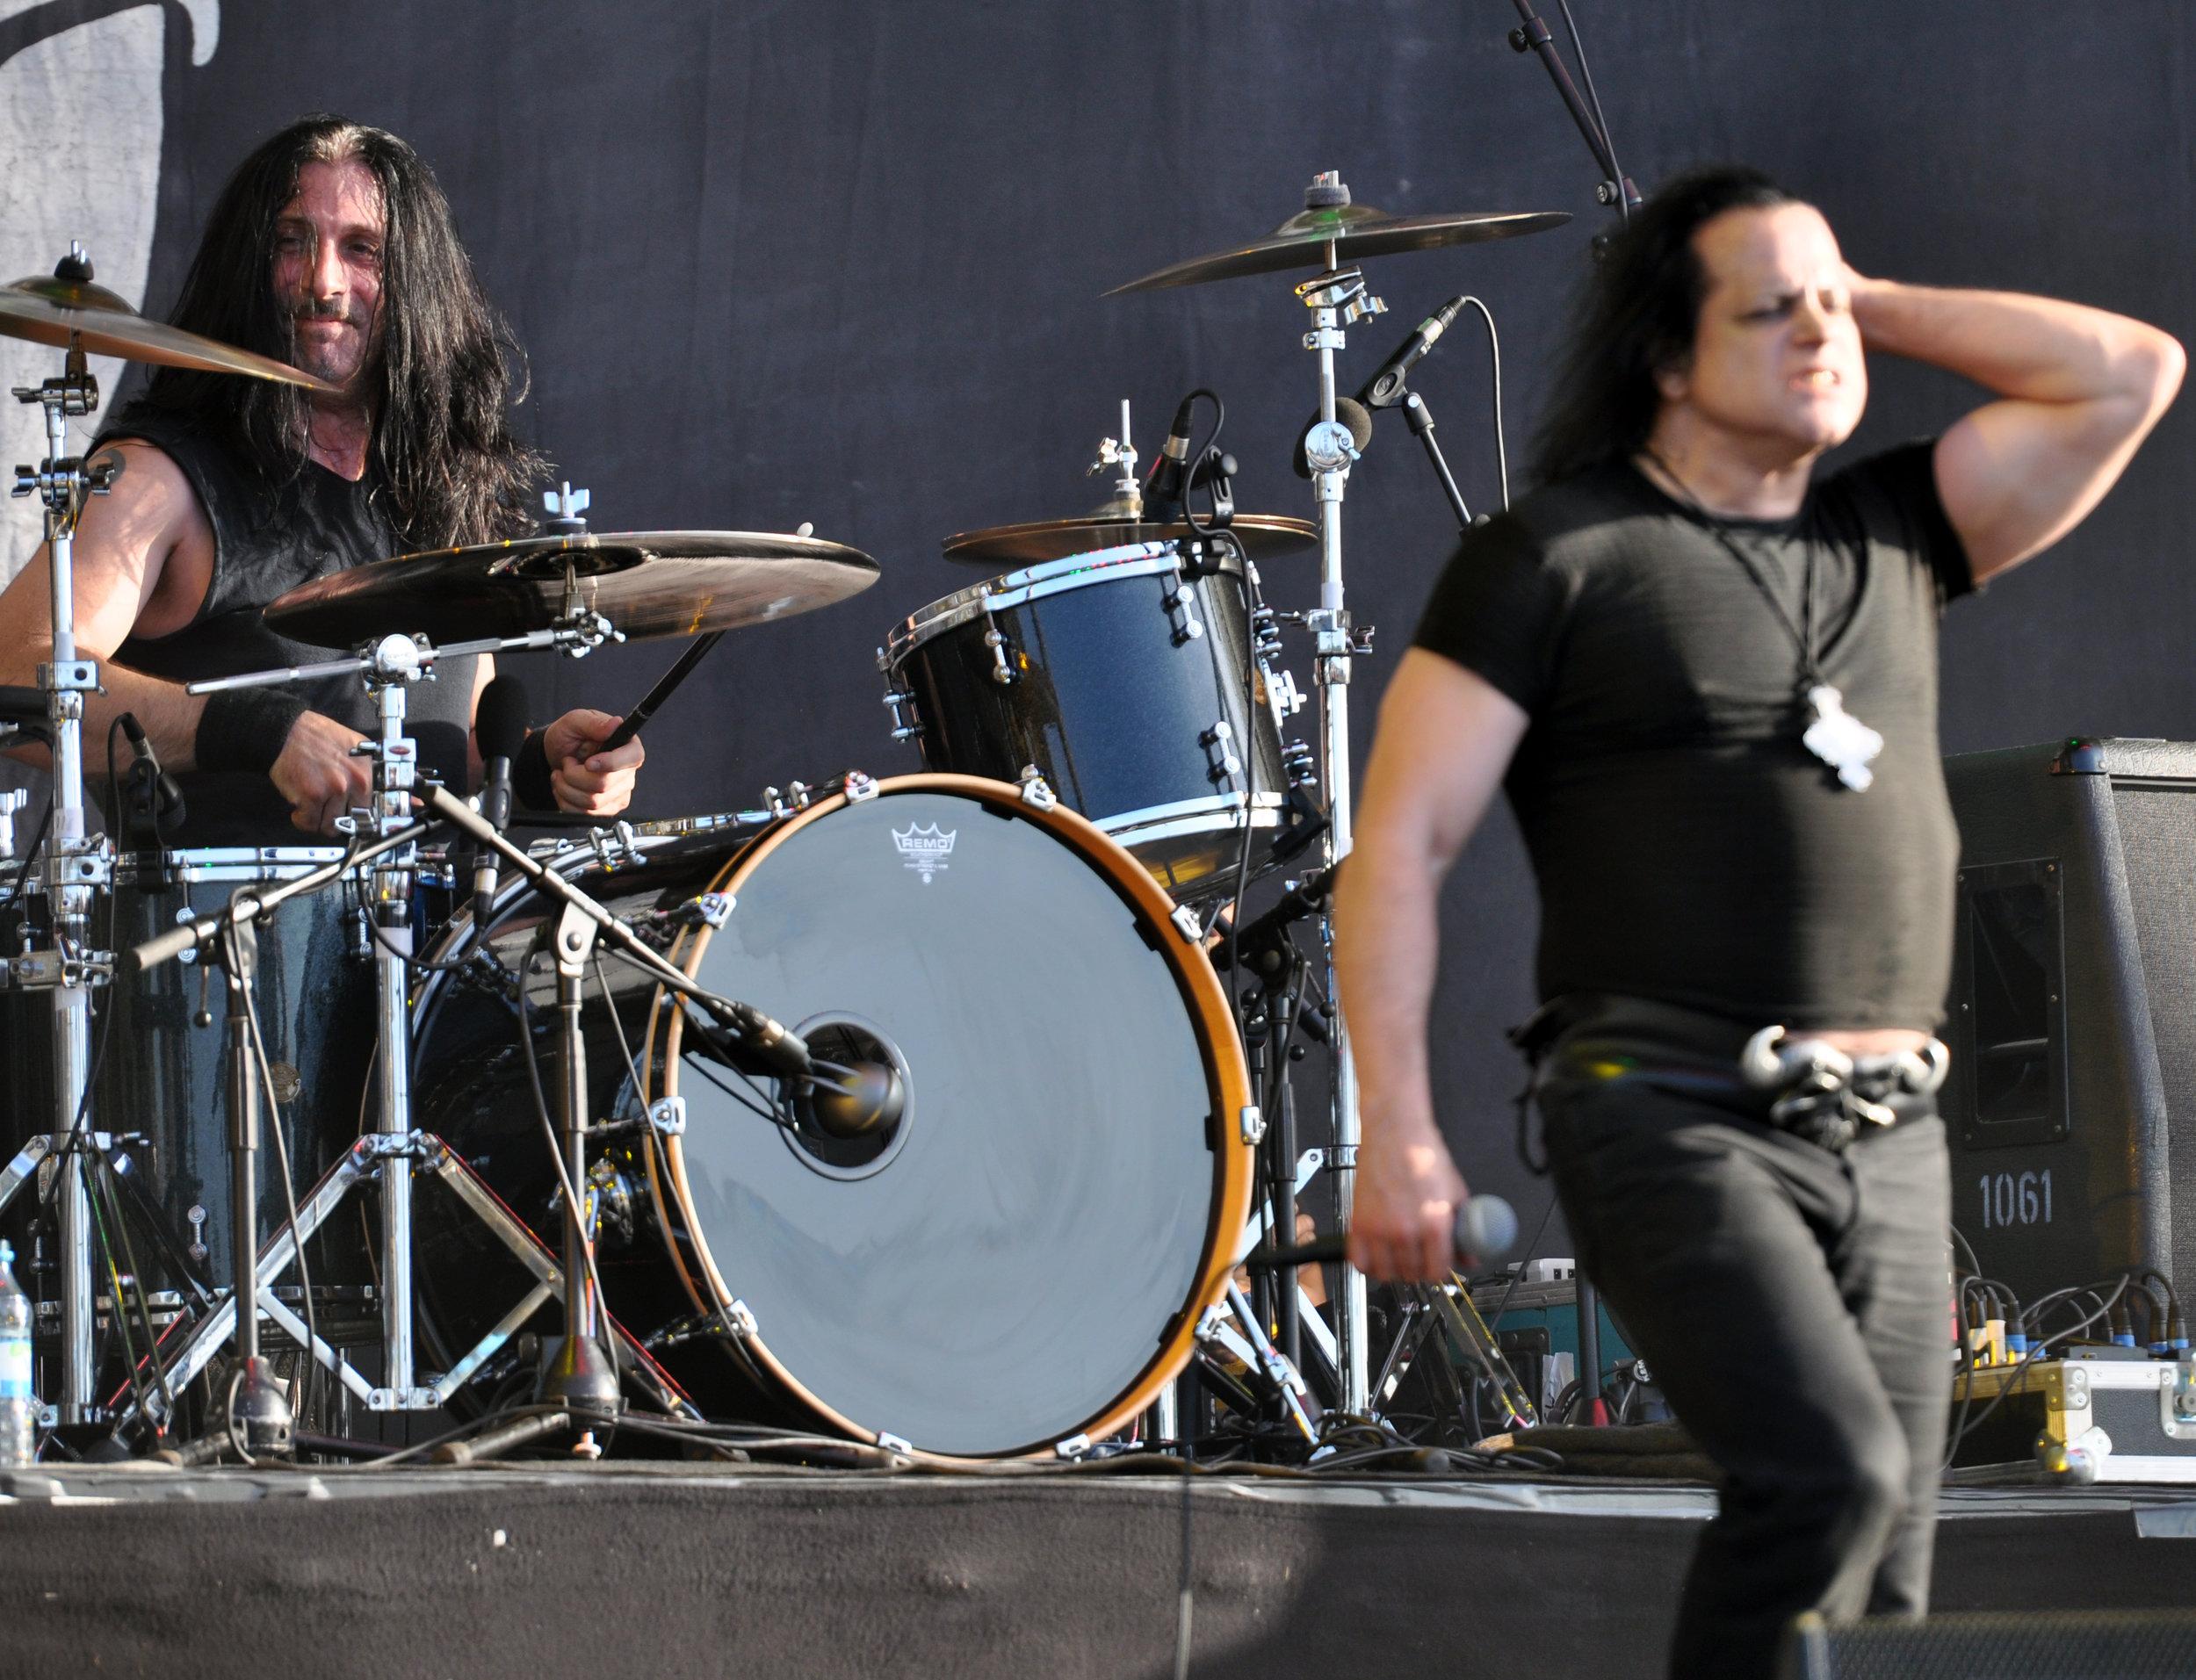 Johnny_Kelly_and_Glenn_Danzig_at_Wacken_Open_Air_2013.jpg